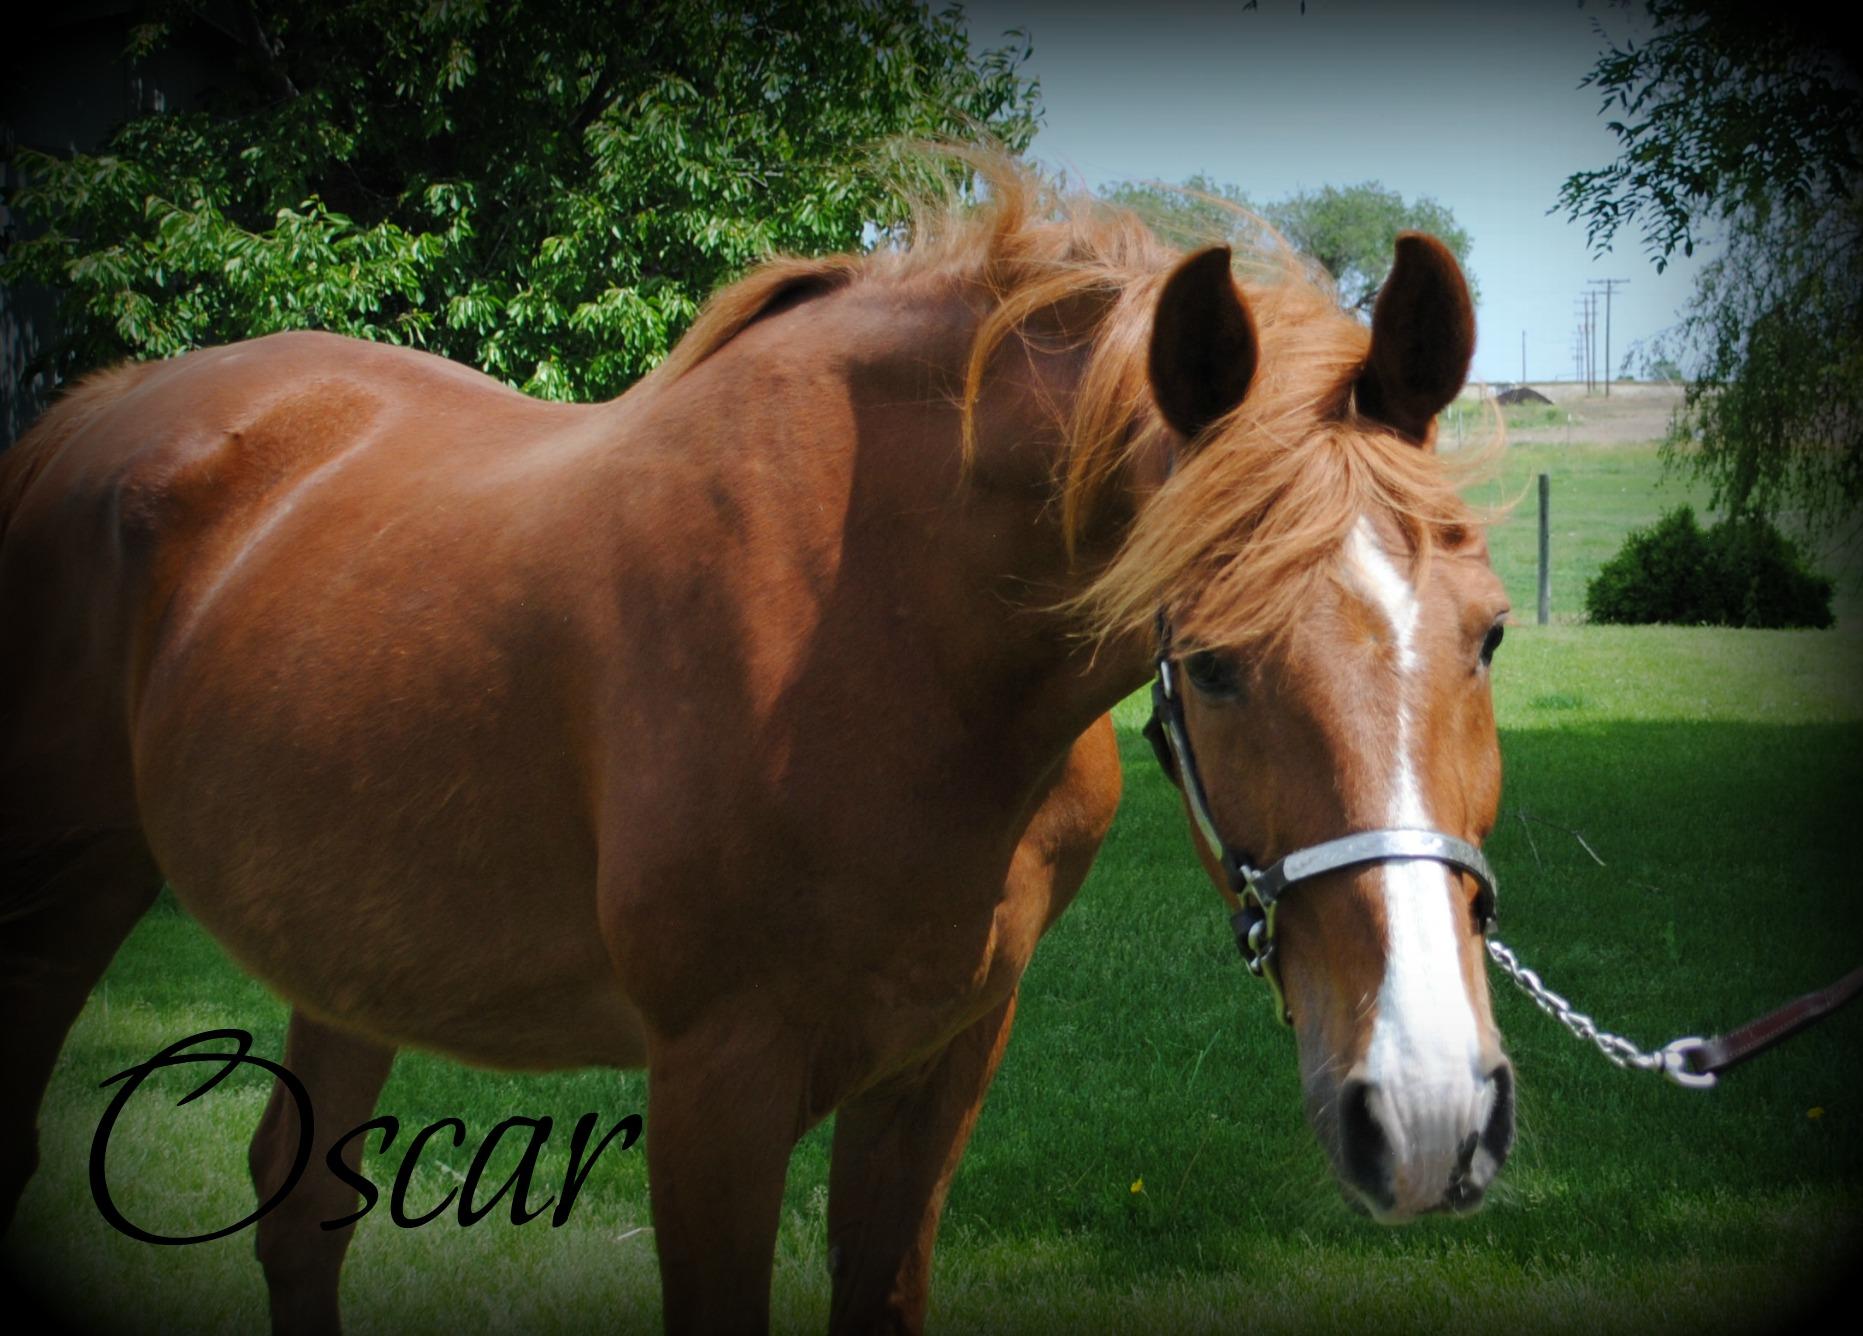 CEOEW-Oscar